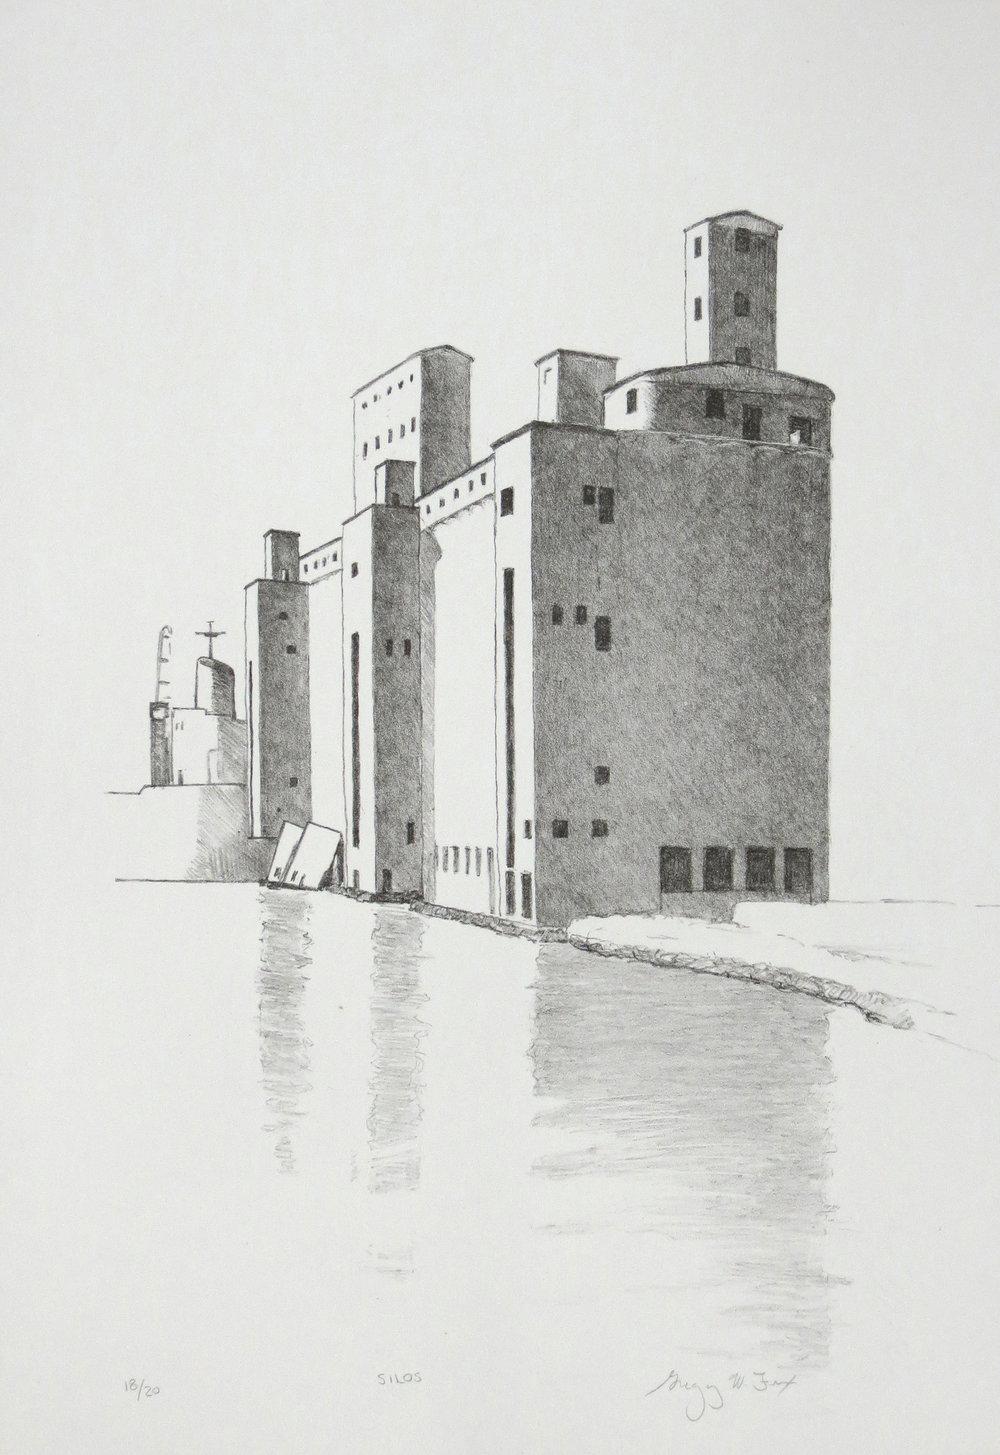 Grain Silos, lithograph